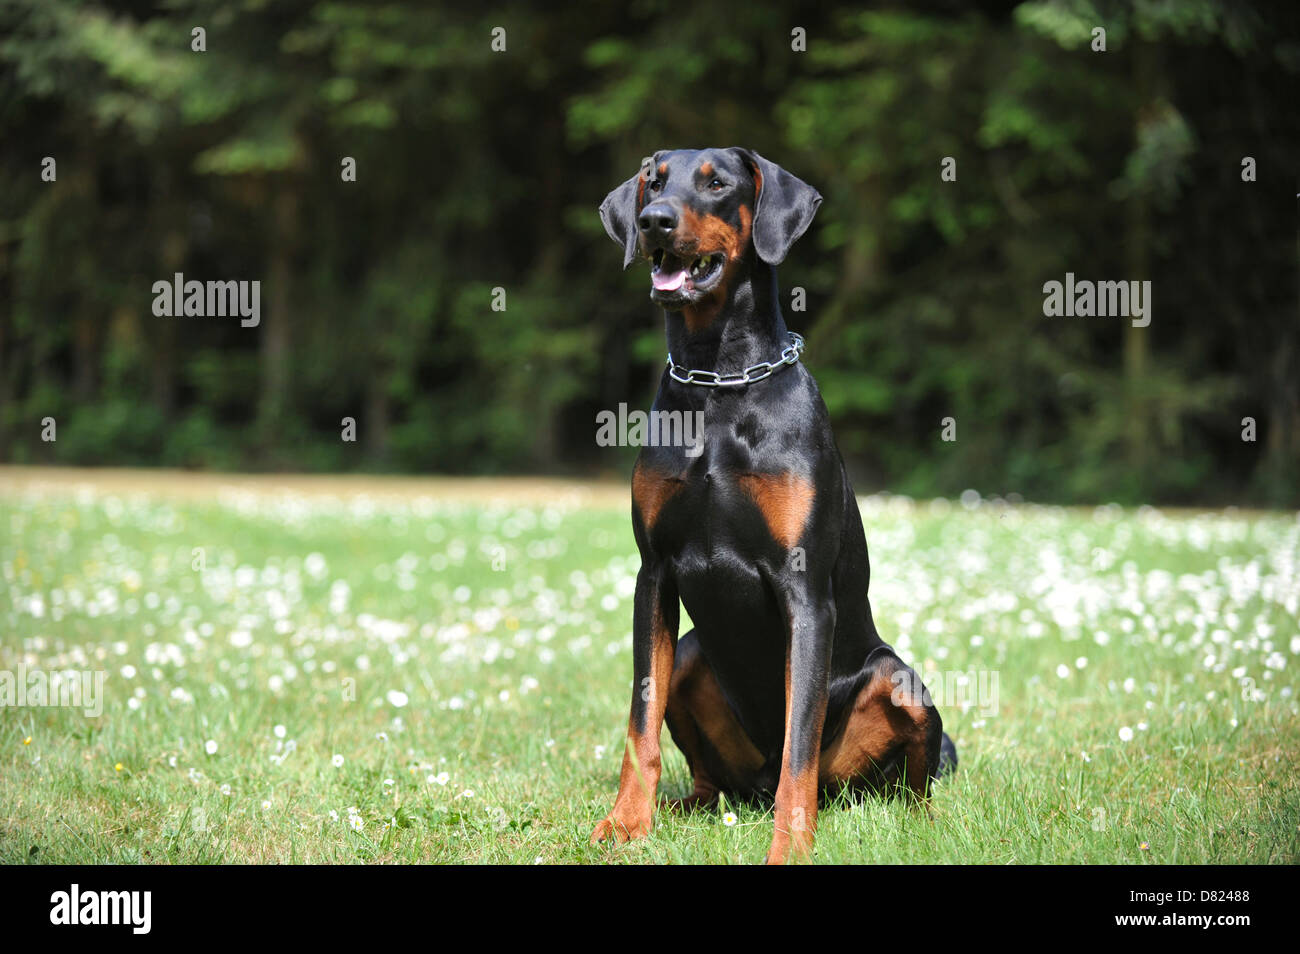 sitting Doberman Pinscher - Stock Image